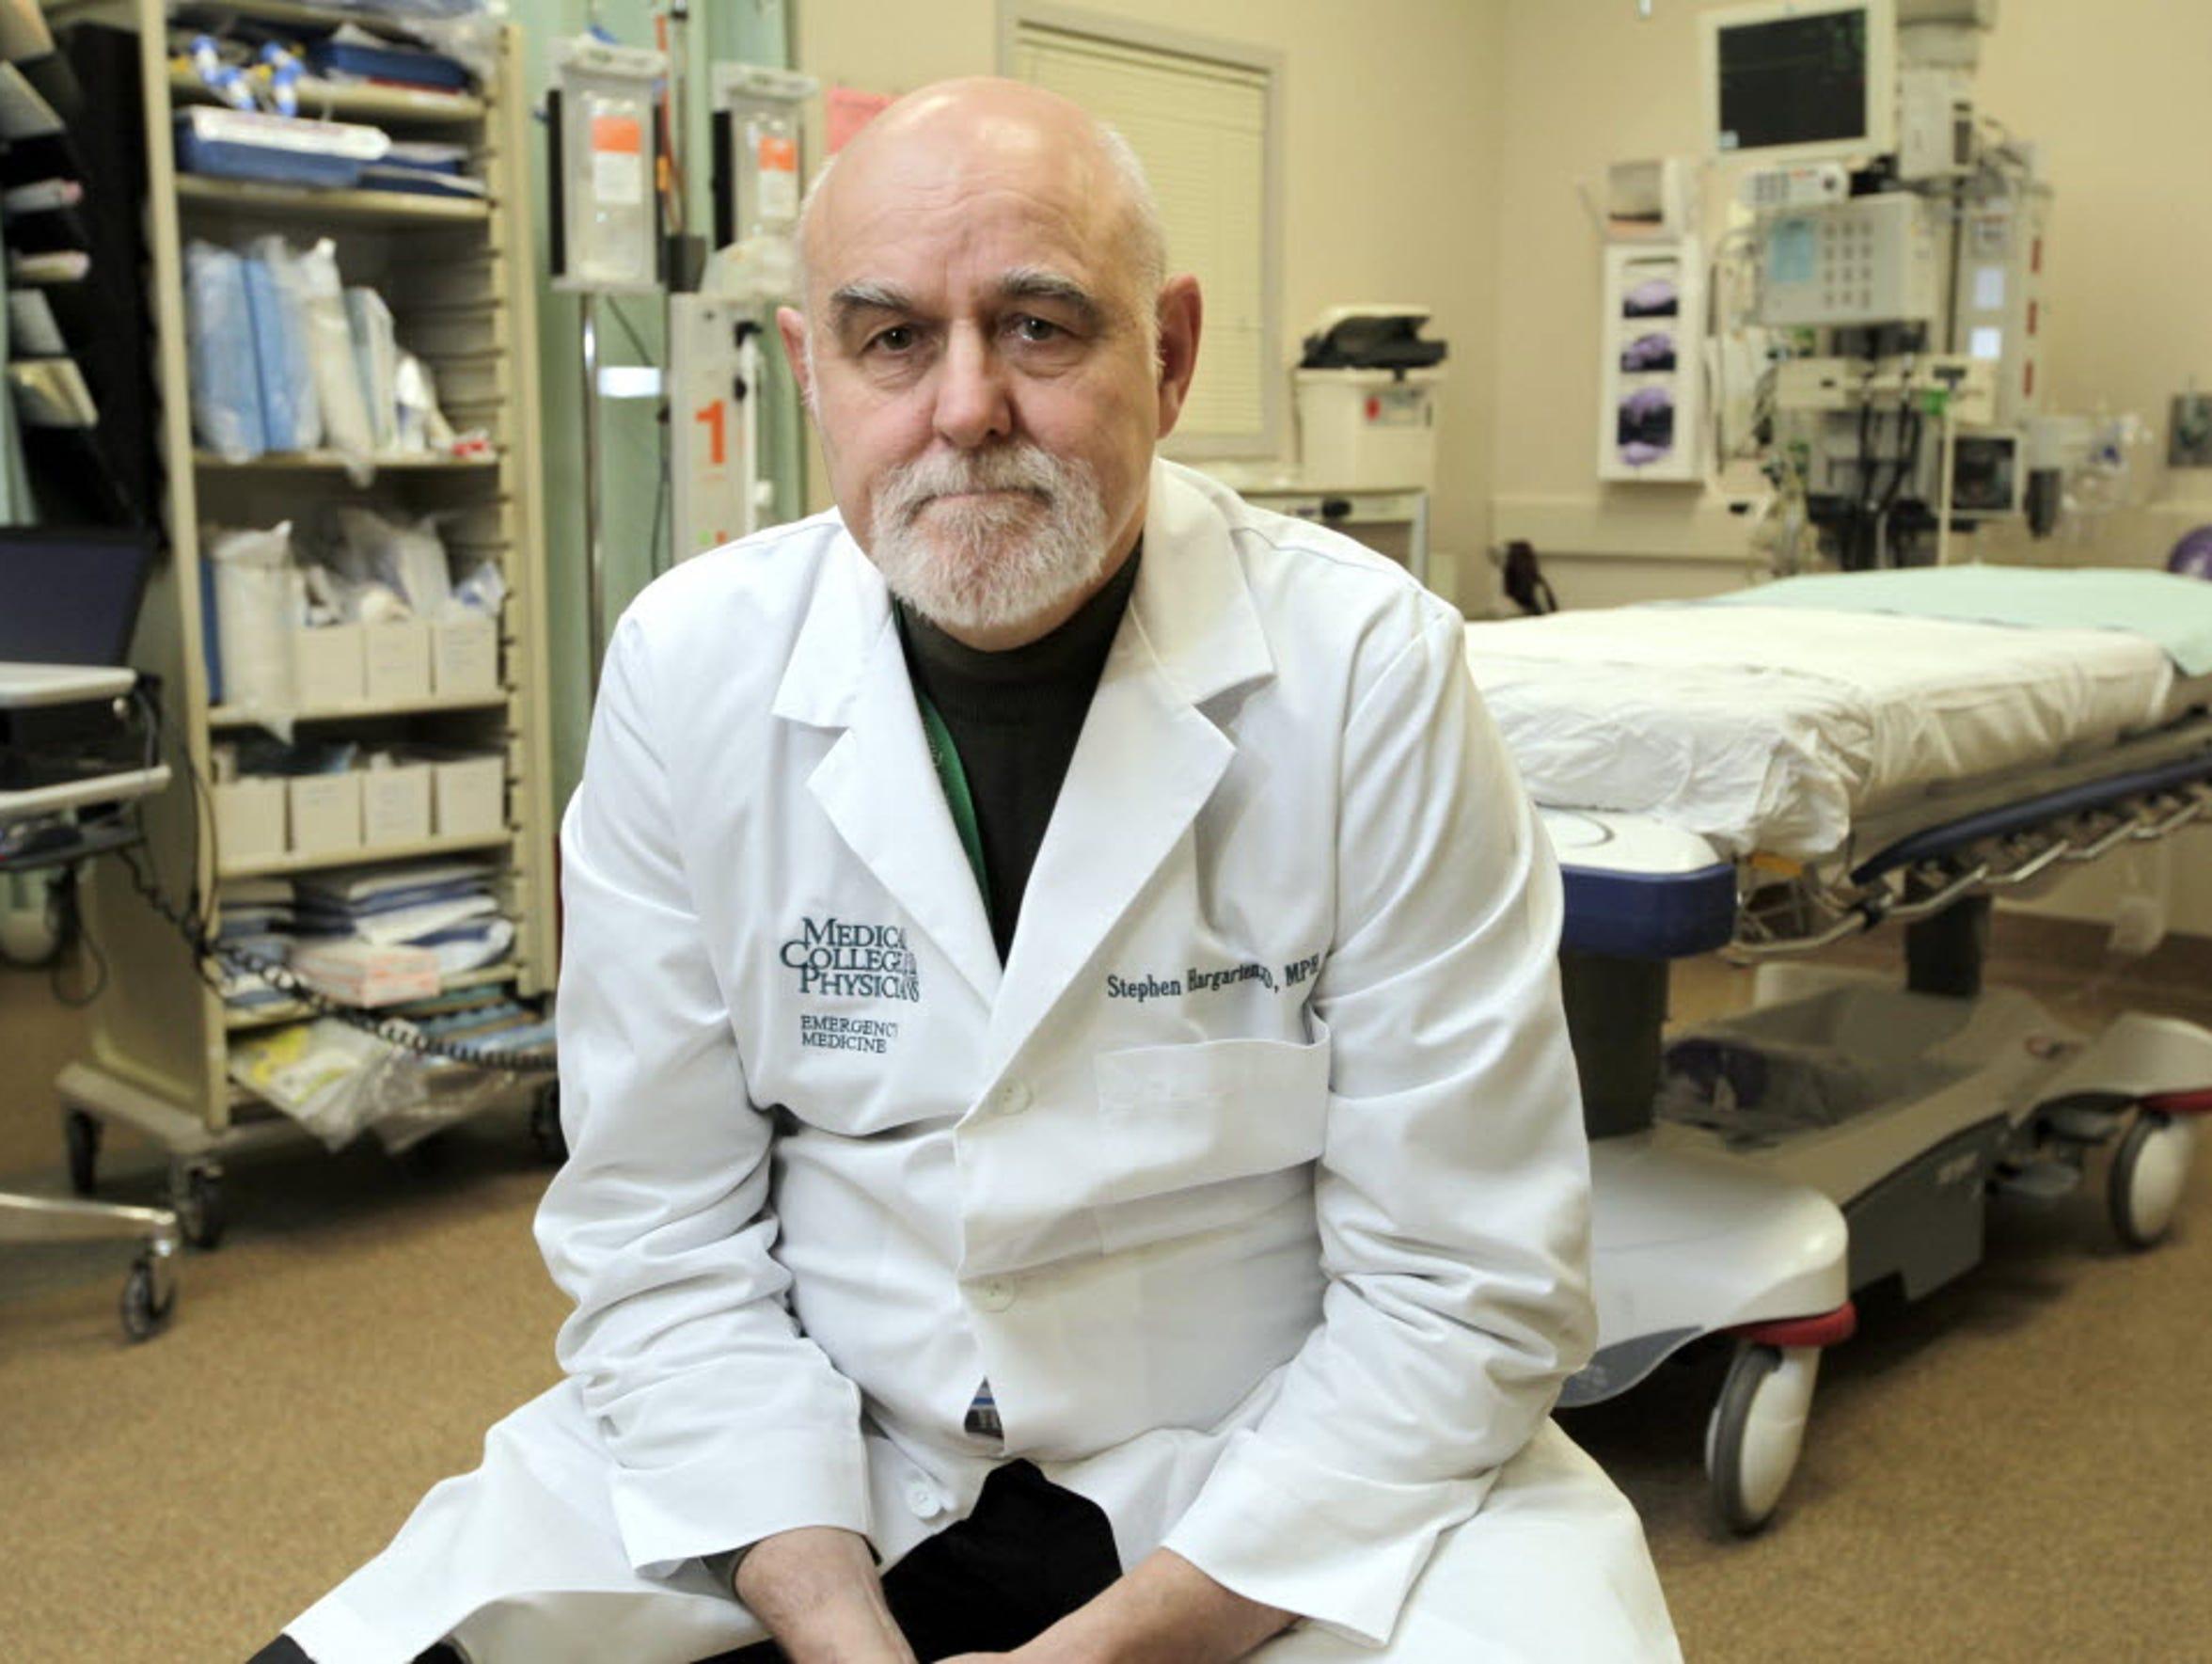 Stephen Hargarten, director of the Injury Research